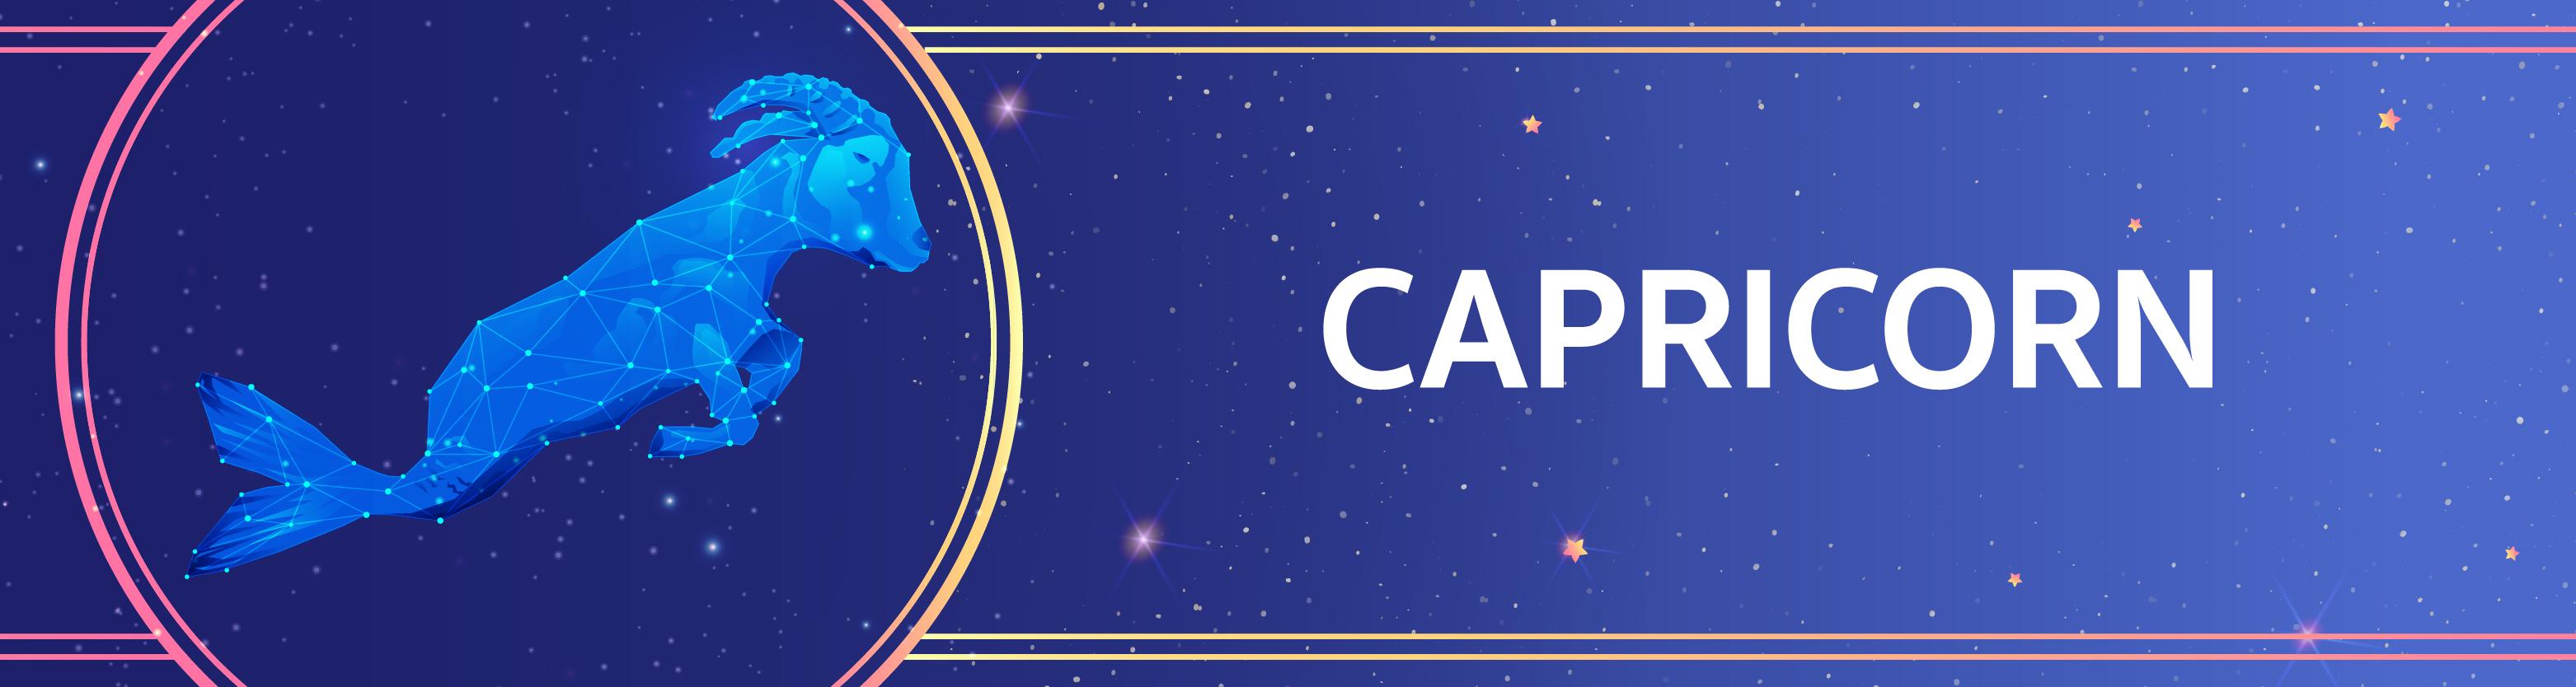 12Capricorn-01